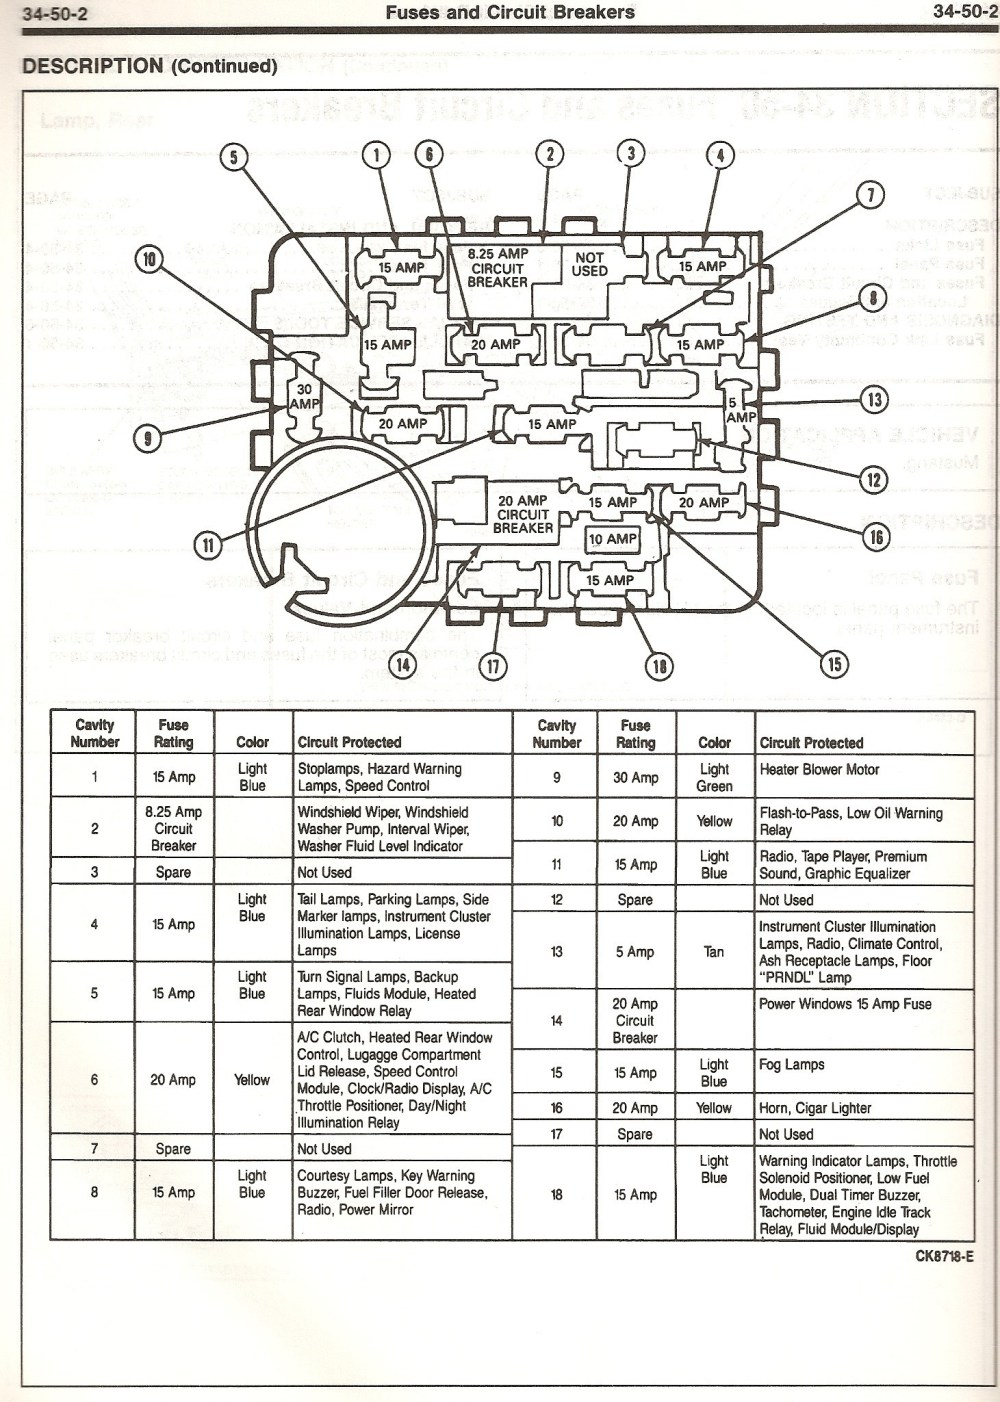 medium resolution of 1996 mustang fuse box wiring diagram yoy98 ford mustang gt fuse diagram wiring diagram 1996 taurus